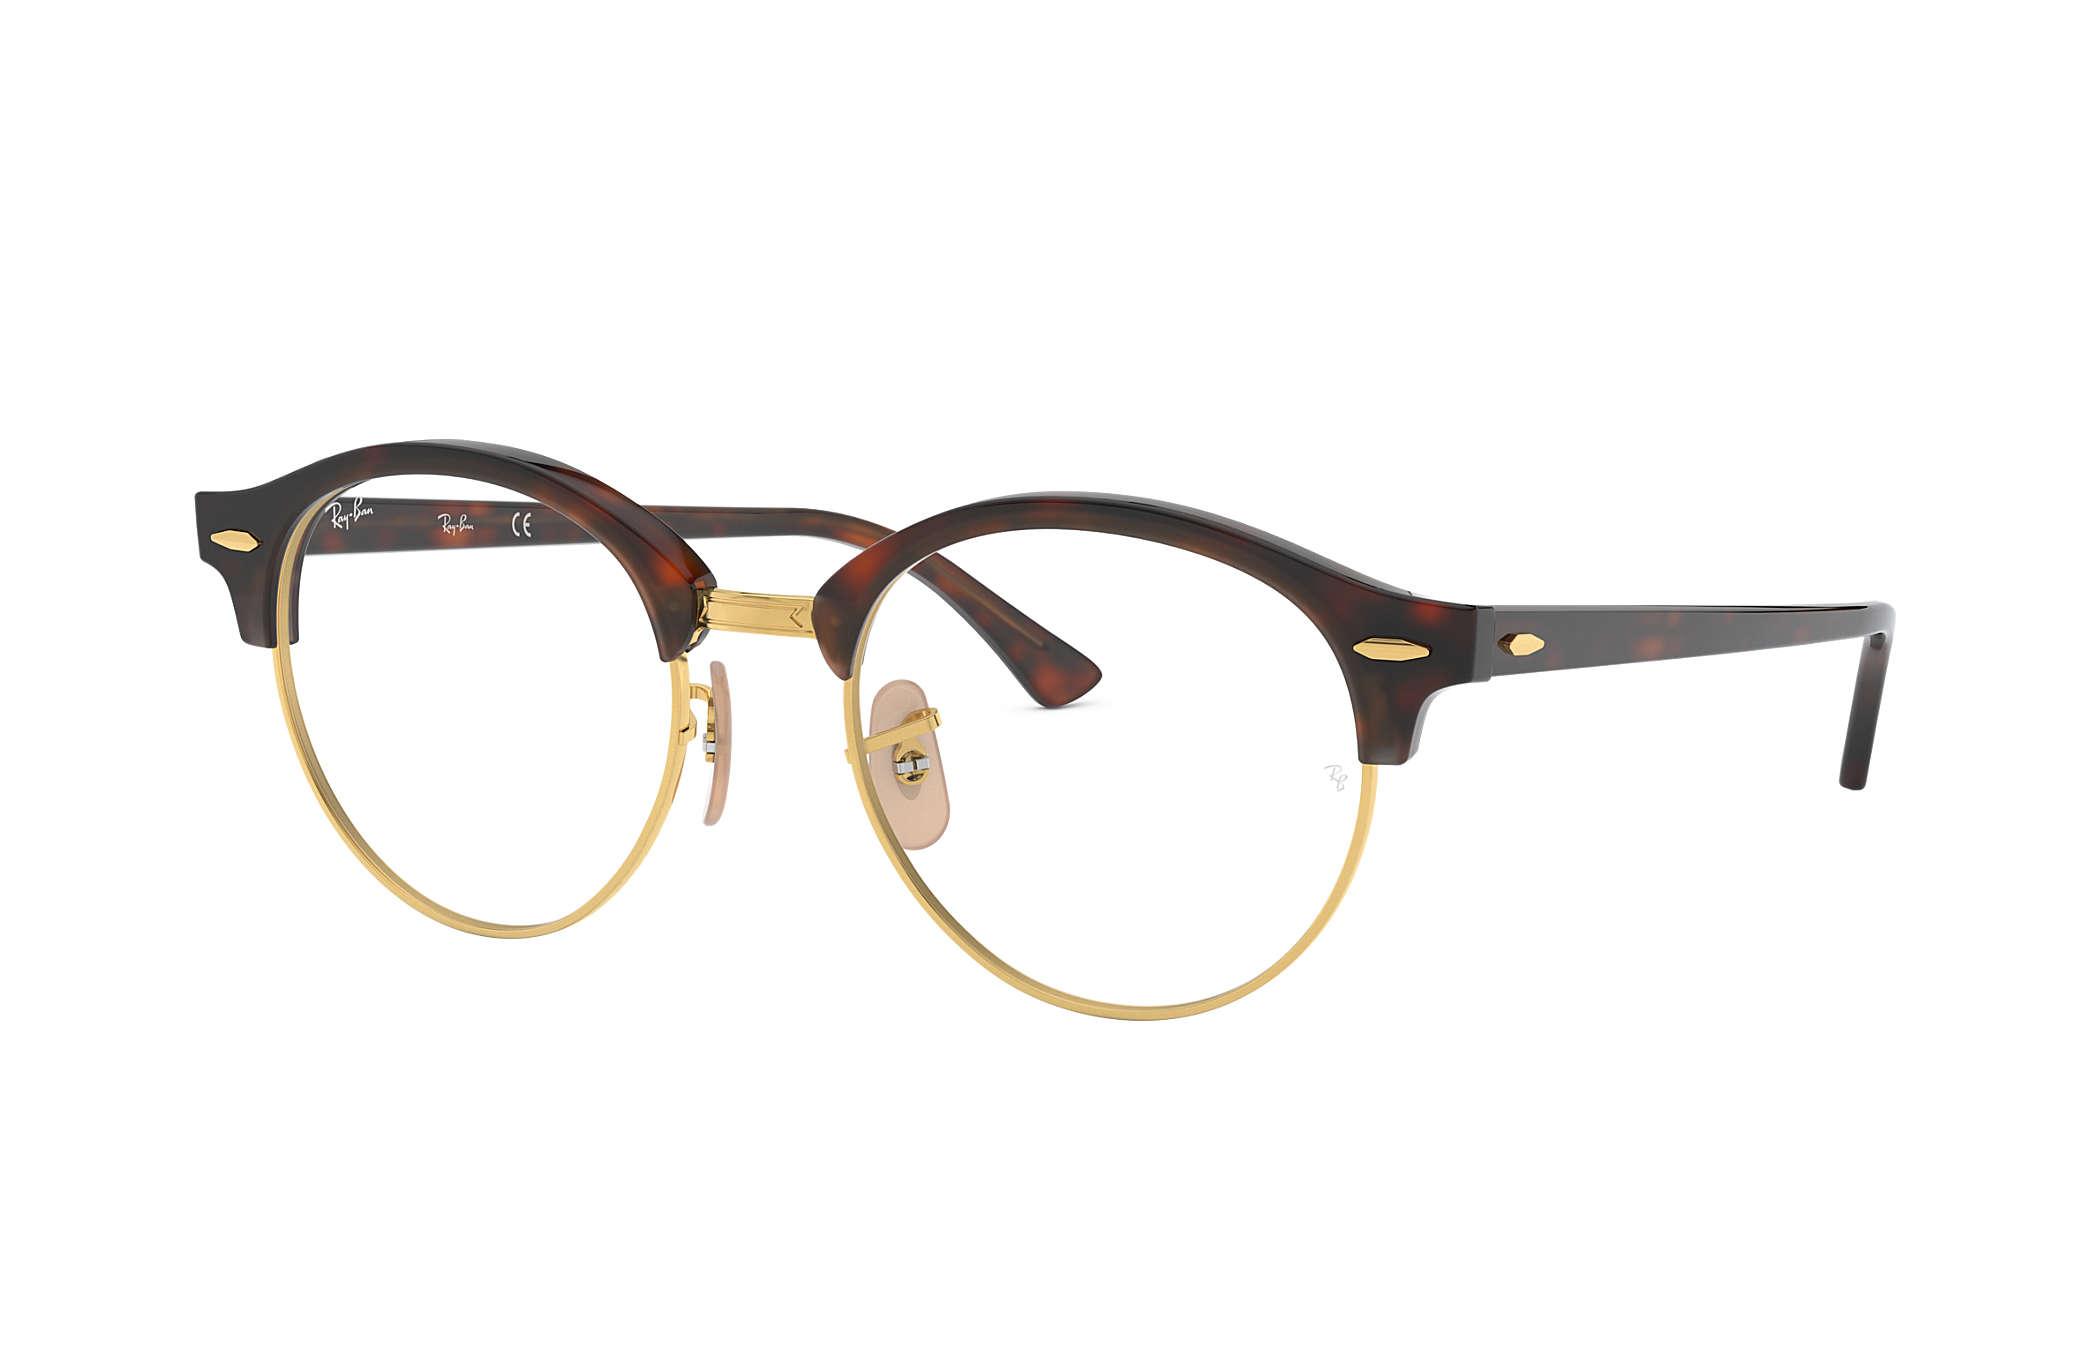 f96ffc260b Ray-Ban prescription glasses Clubround Optics RB4246V Tortoise ...